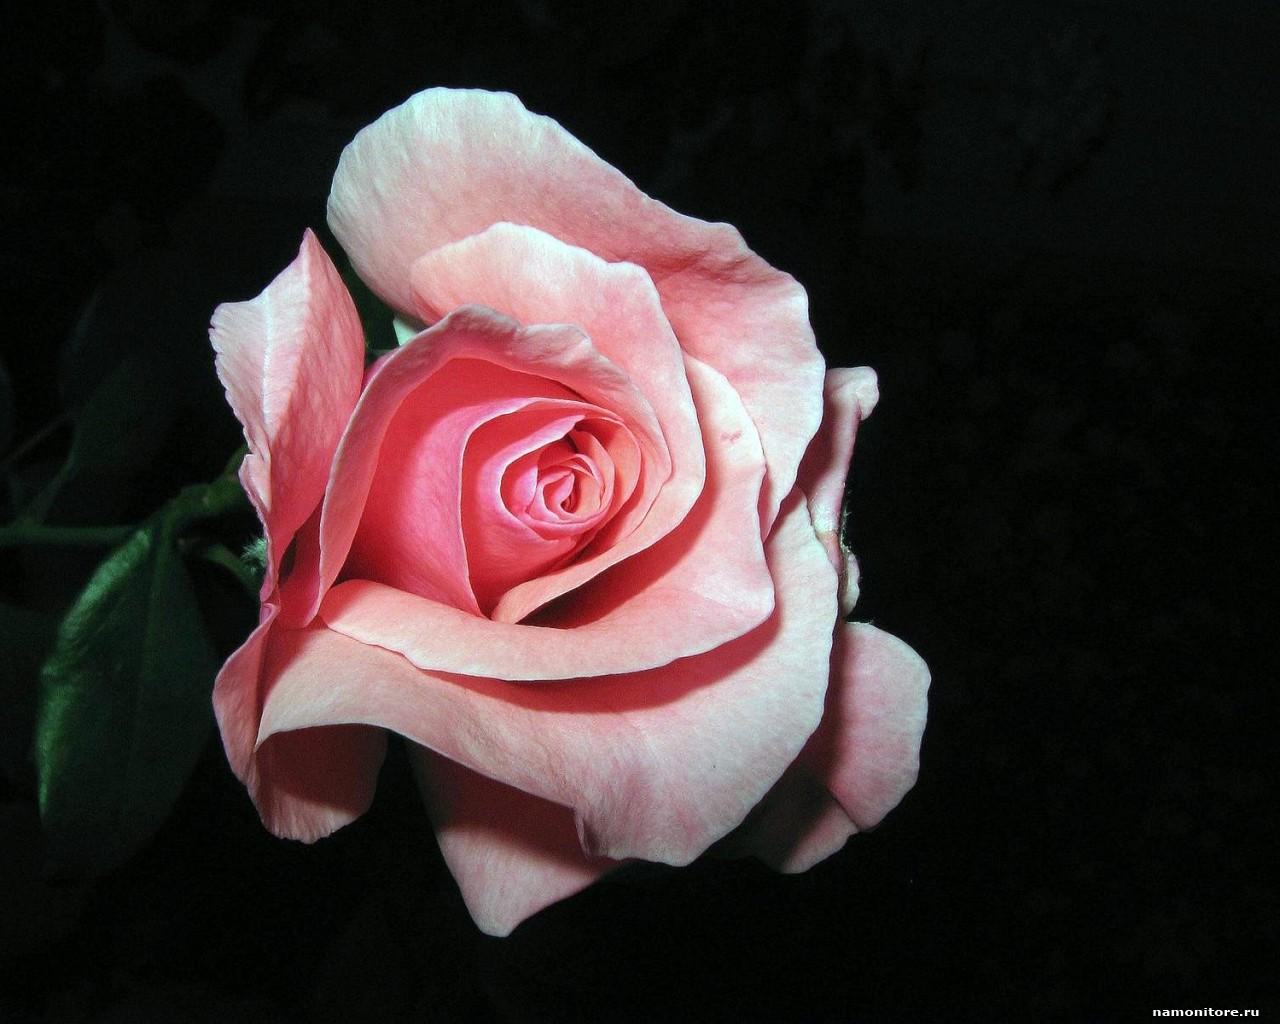 [45+] Pink And Black Rose Wallpaper On WallpaperSafari